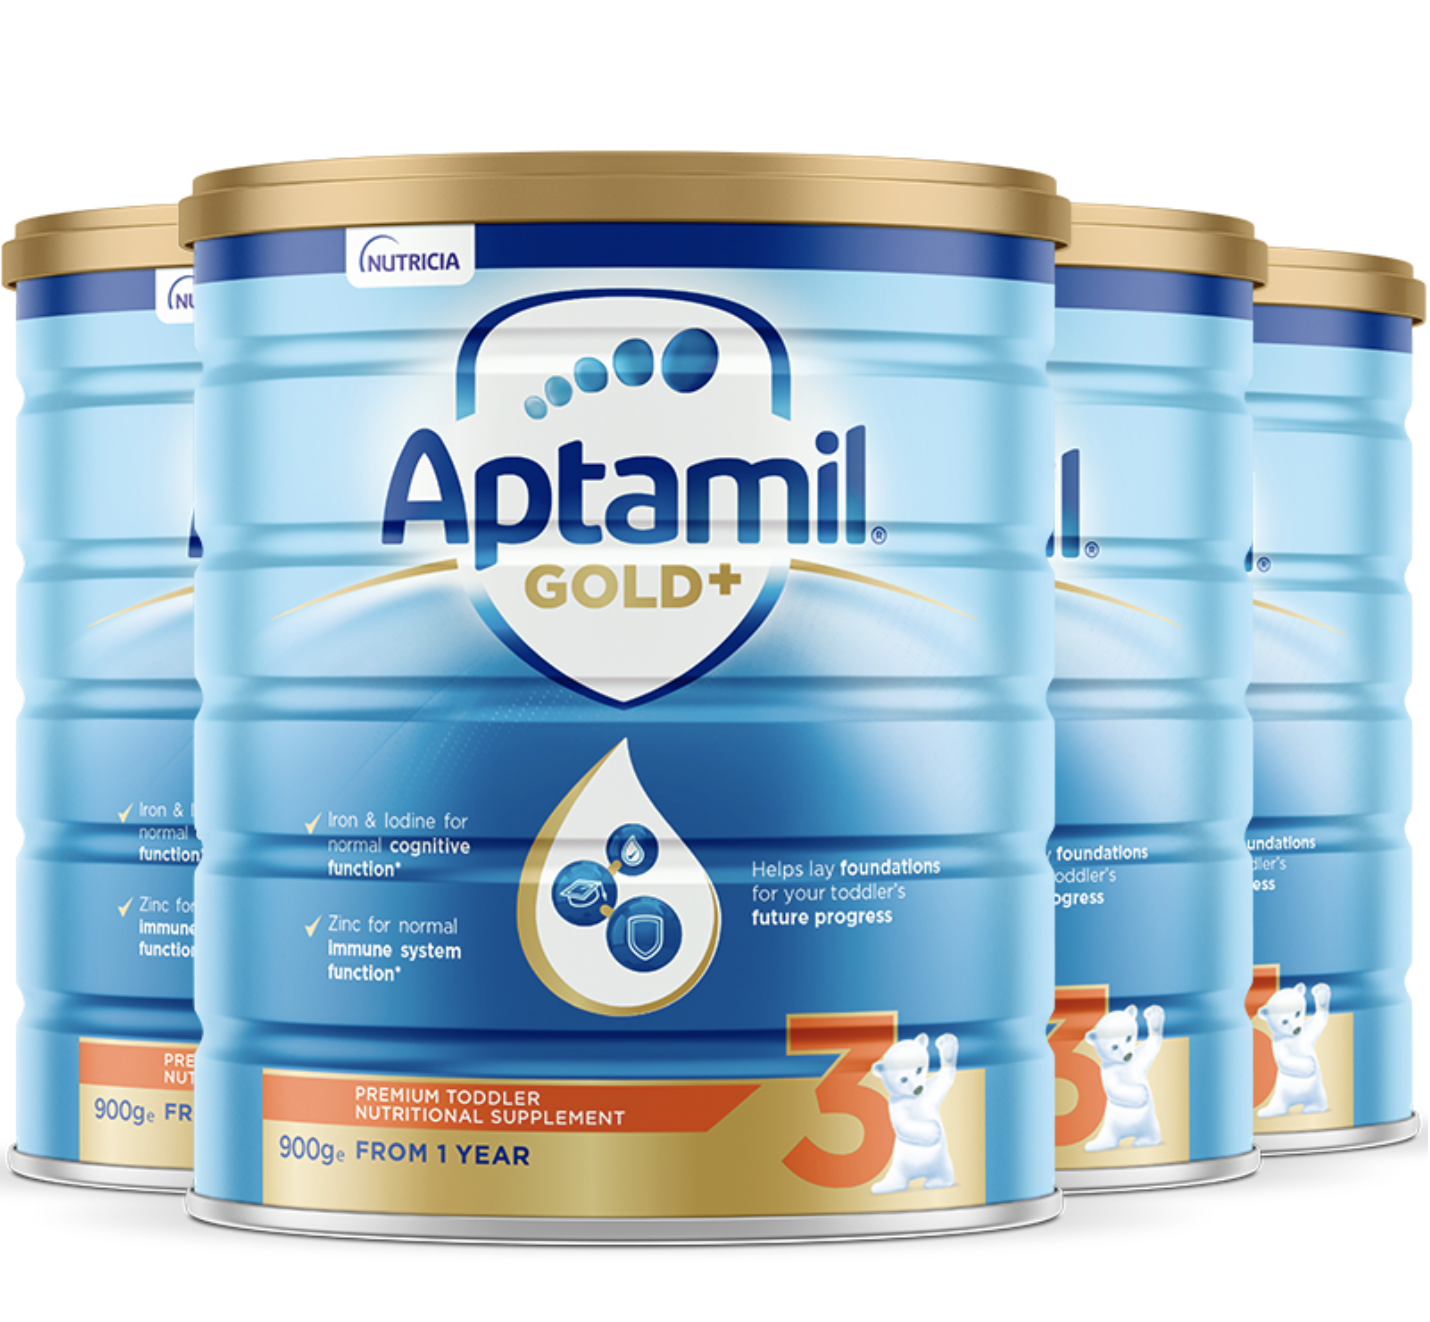 Aptamil 爱他美 金装 幼儿配方奶粉 3段 900g*4罐(1-2岁)澳版